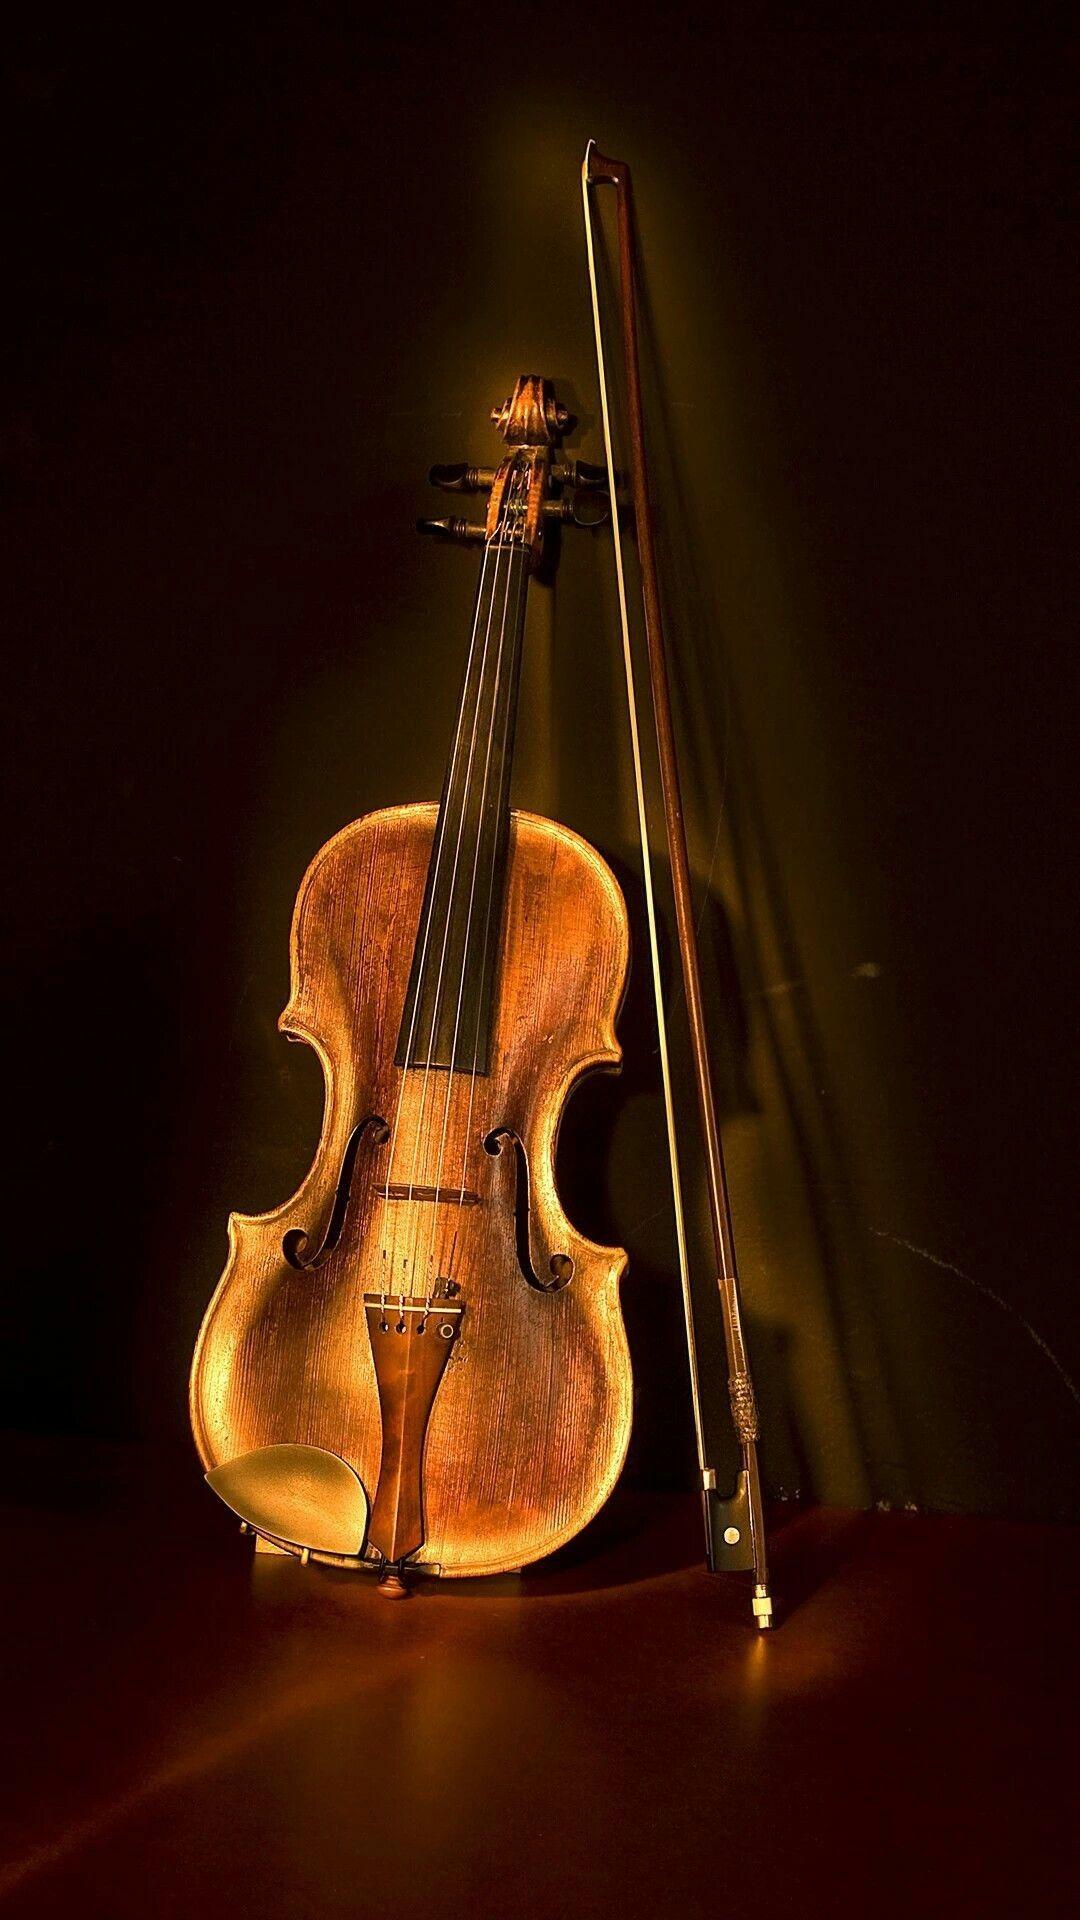 New Violin Images For Wallpaper Cool Violins Violin Image Violin